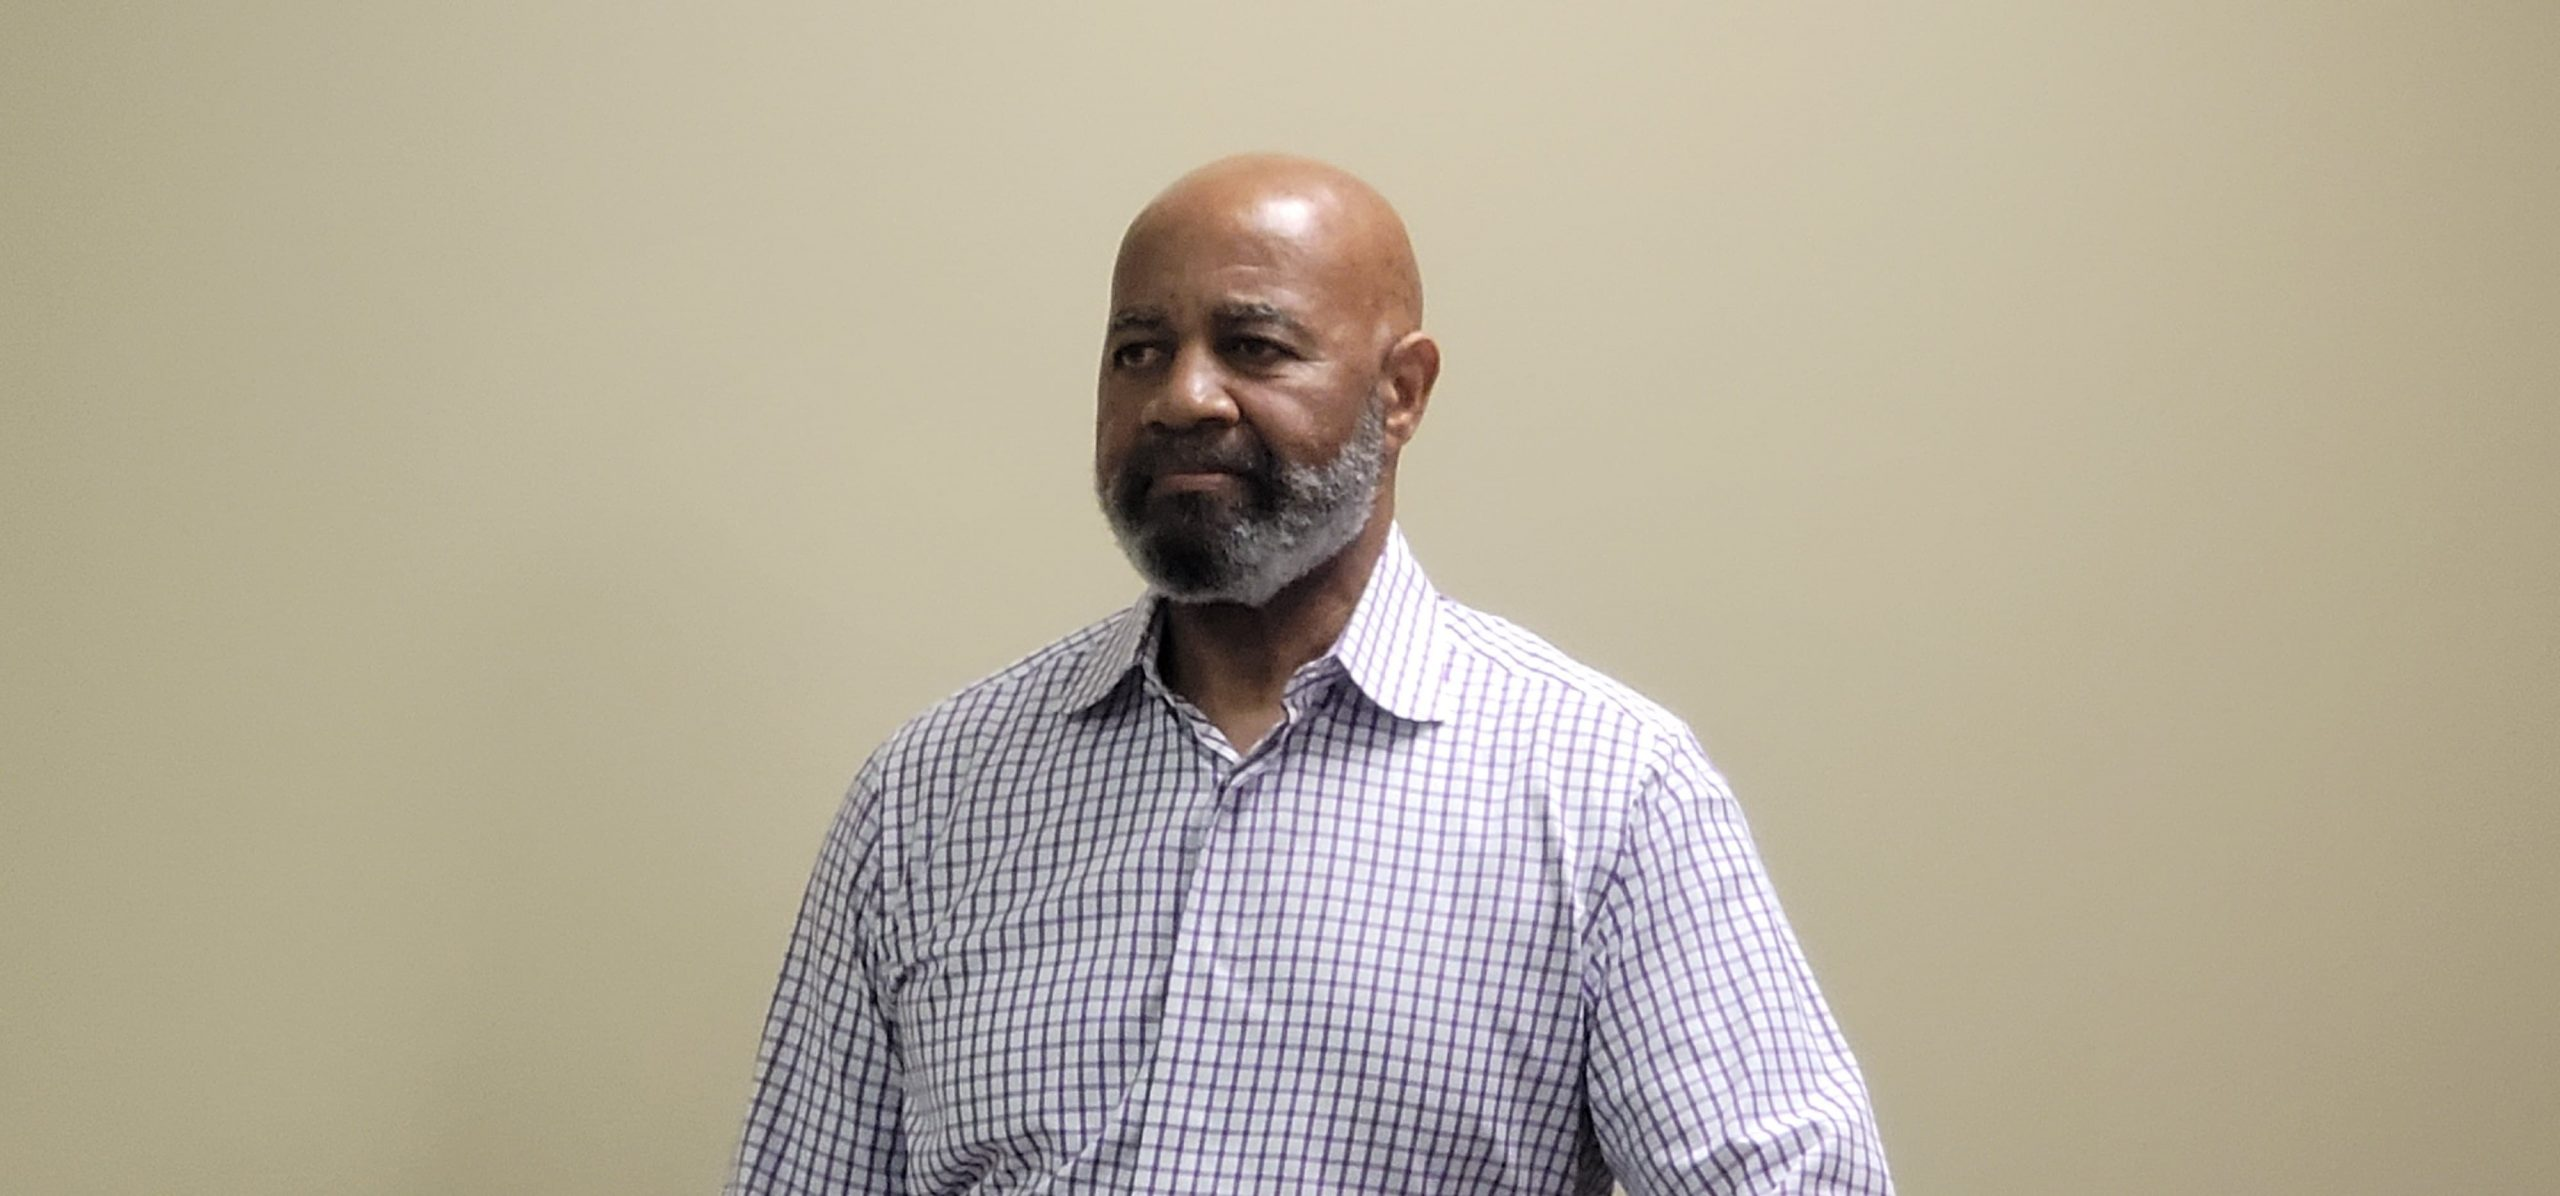 STAN THE MAN: Stan Garrett leaves Trussville BOE after 16 years